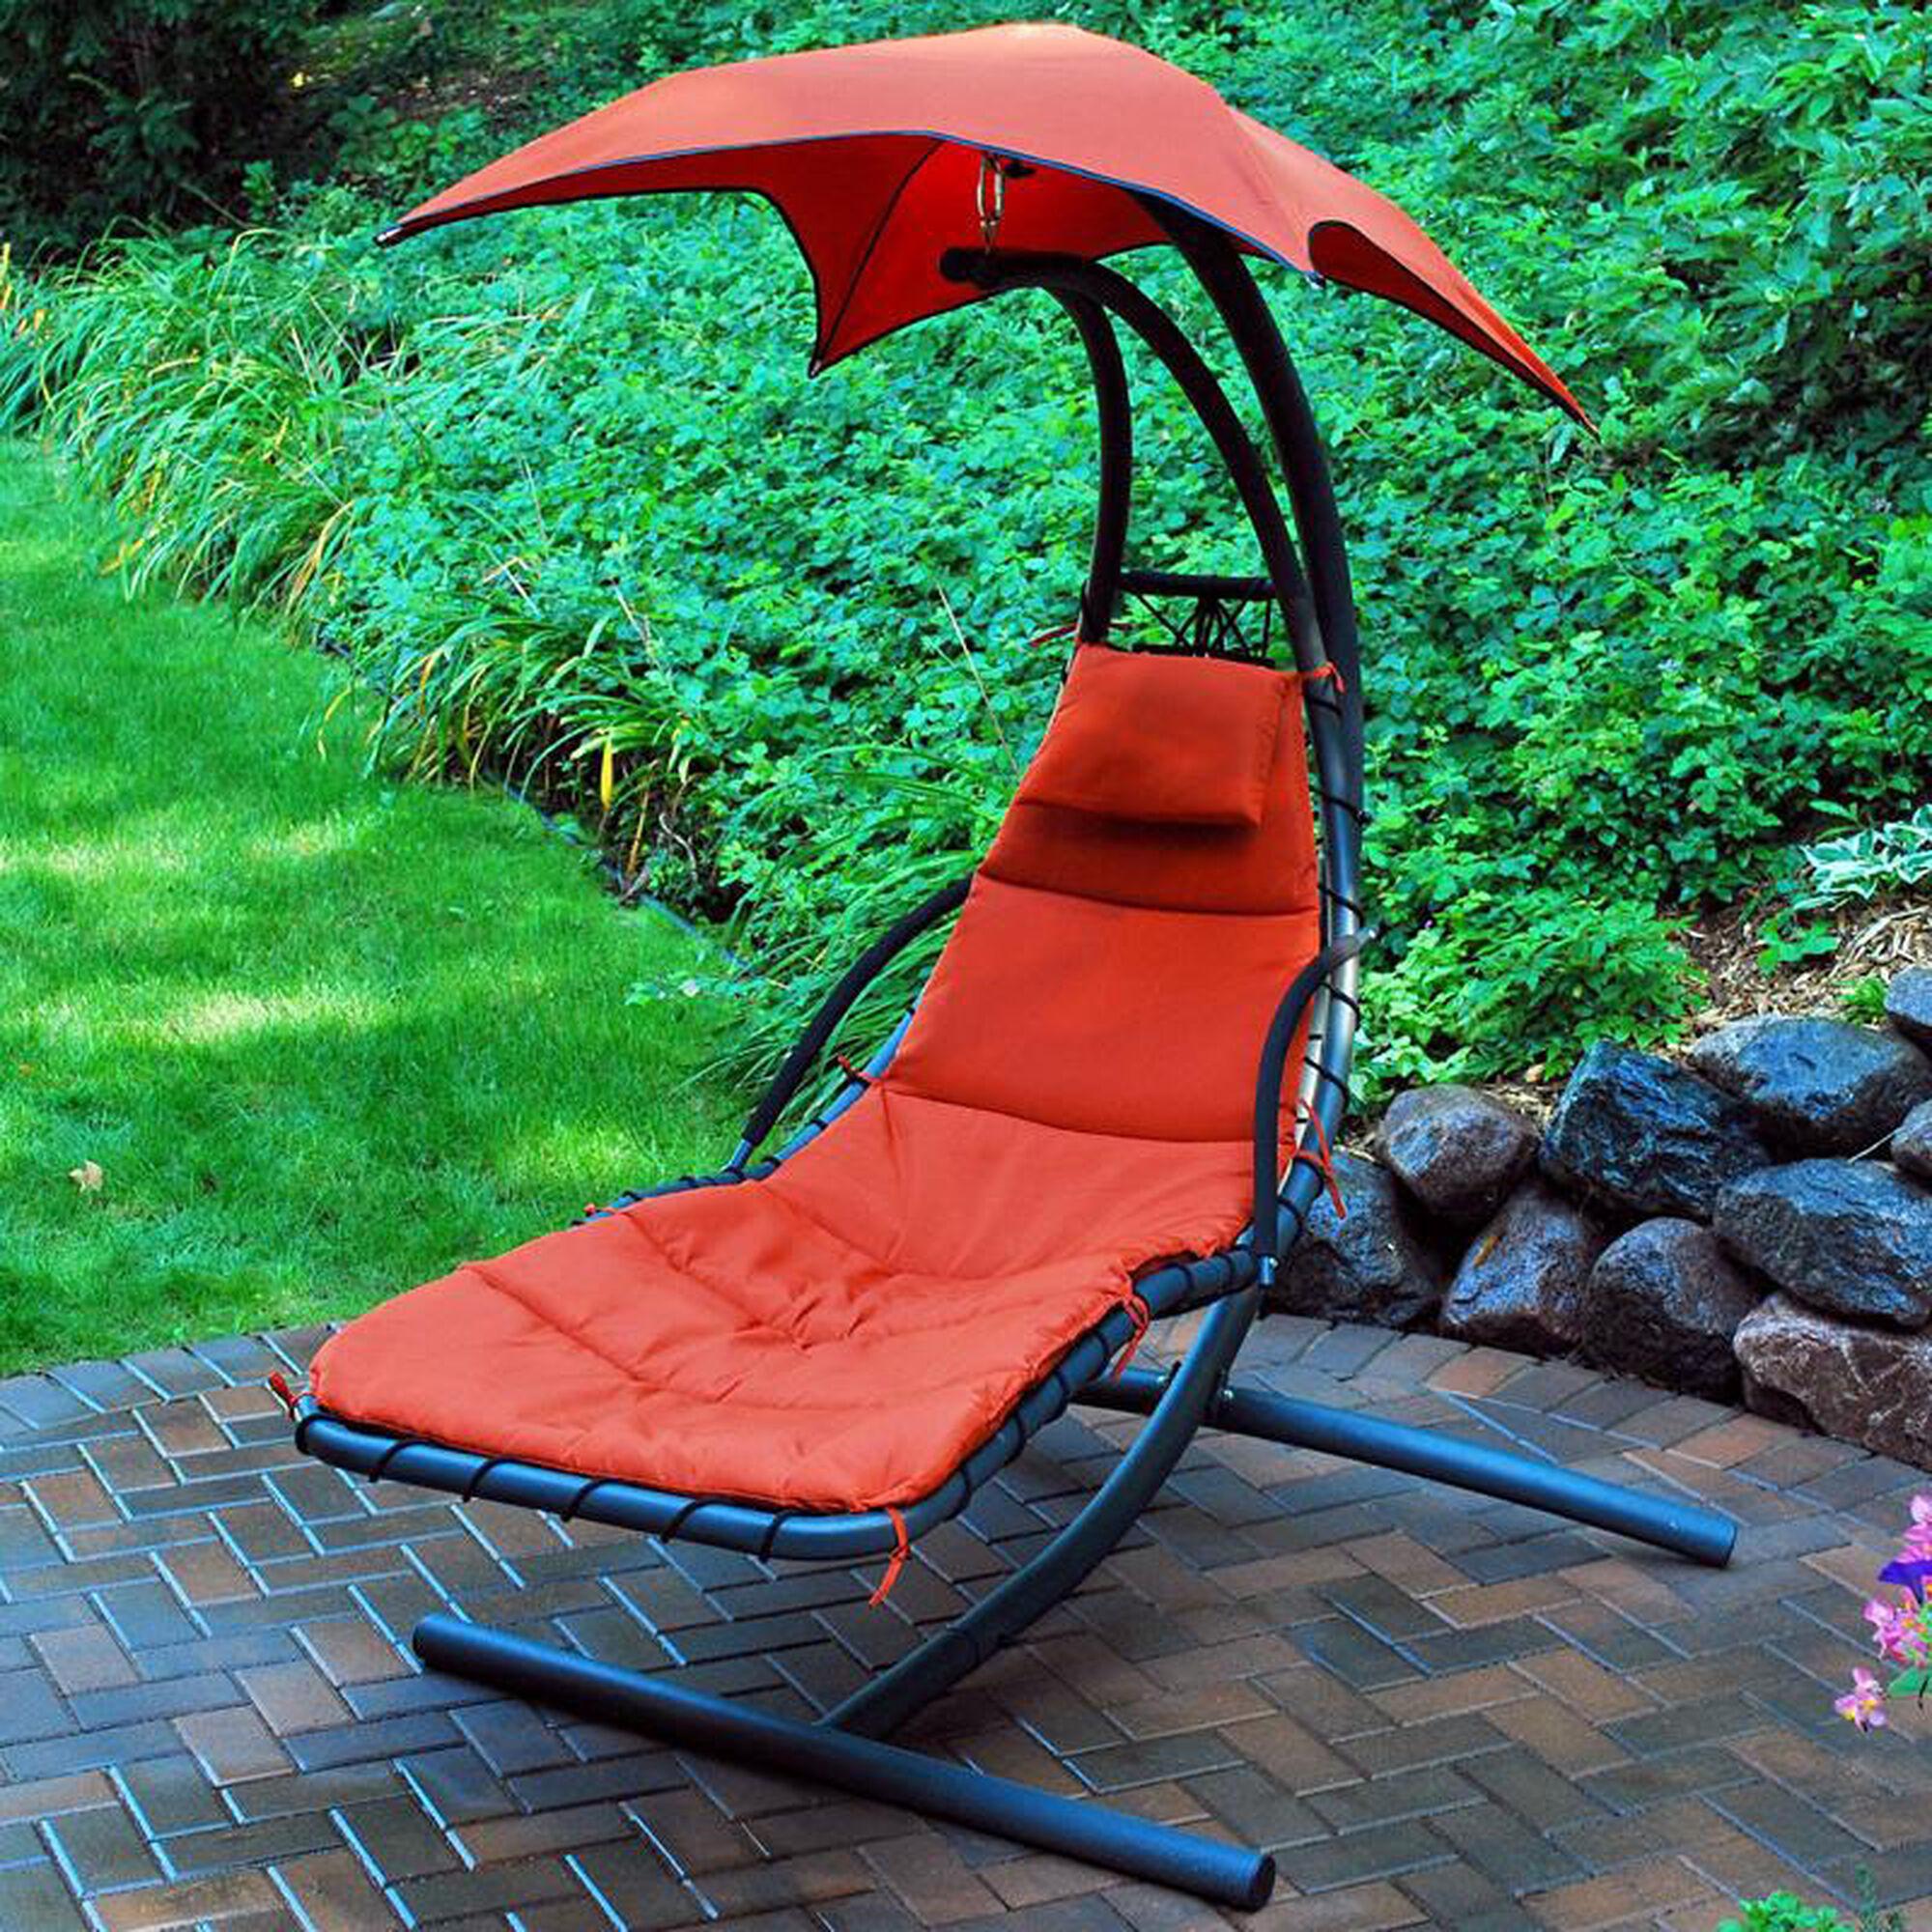 Algoma 4717 alg 4717 for Burnt orange chaise lounge